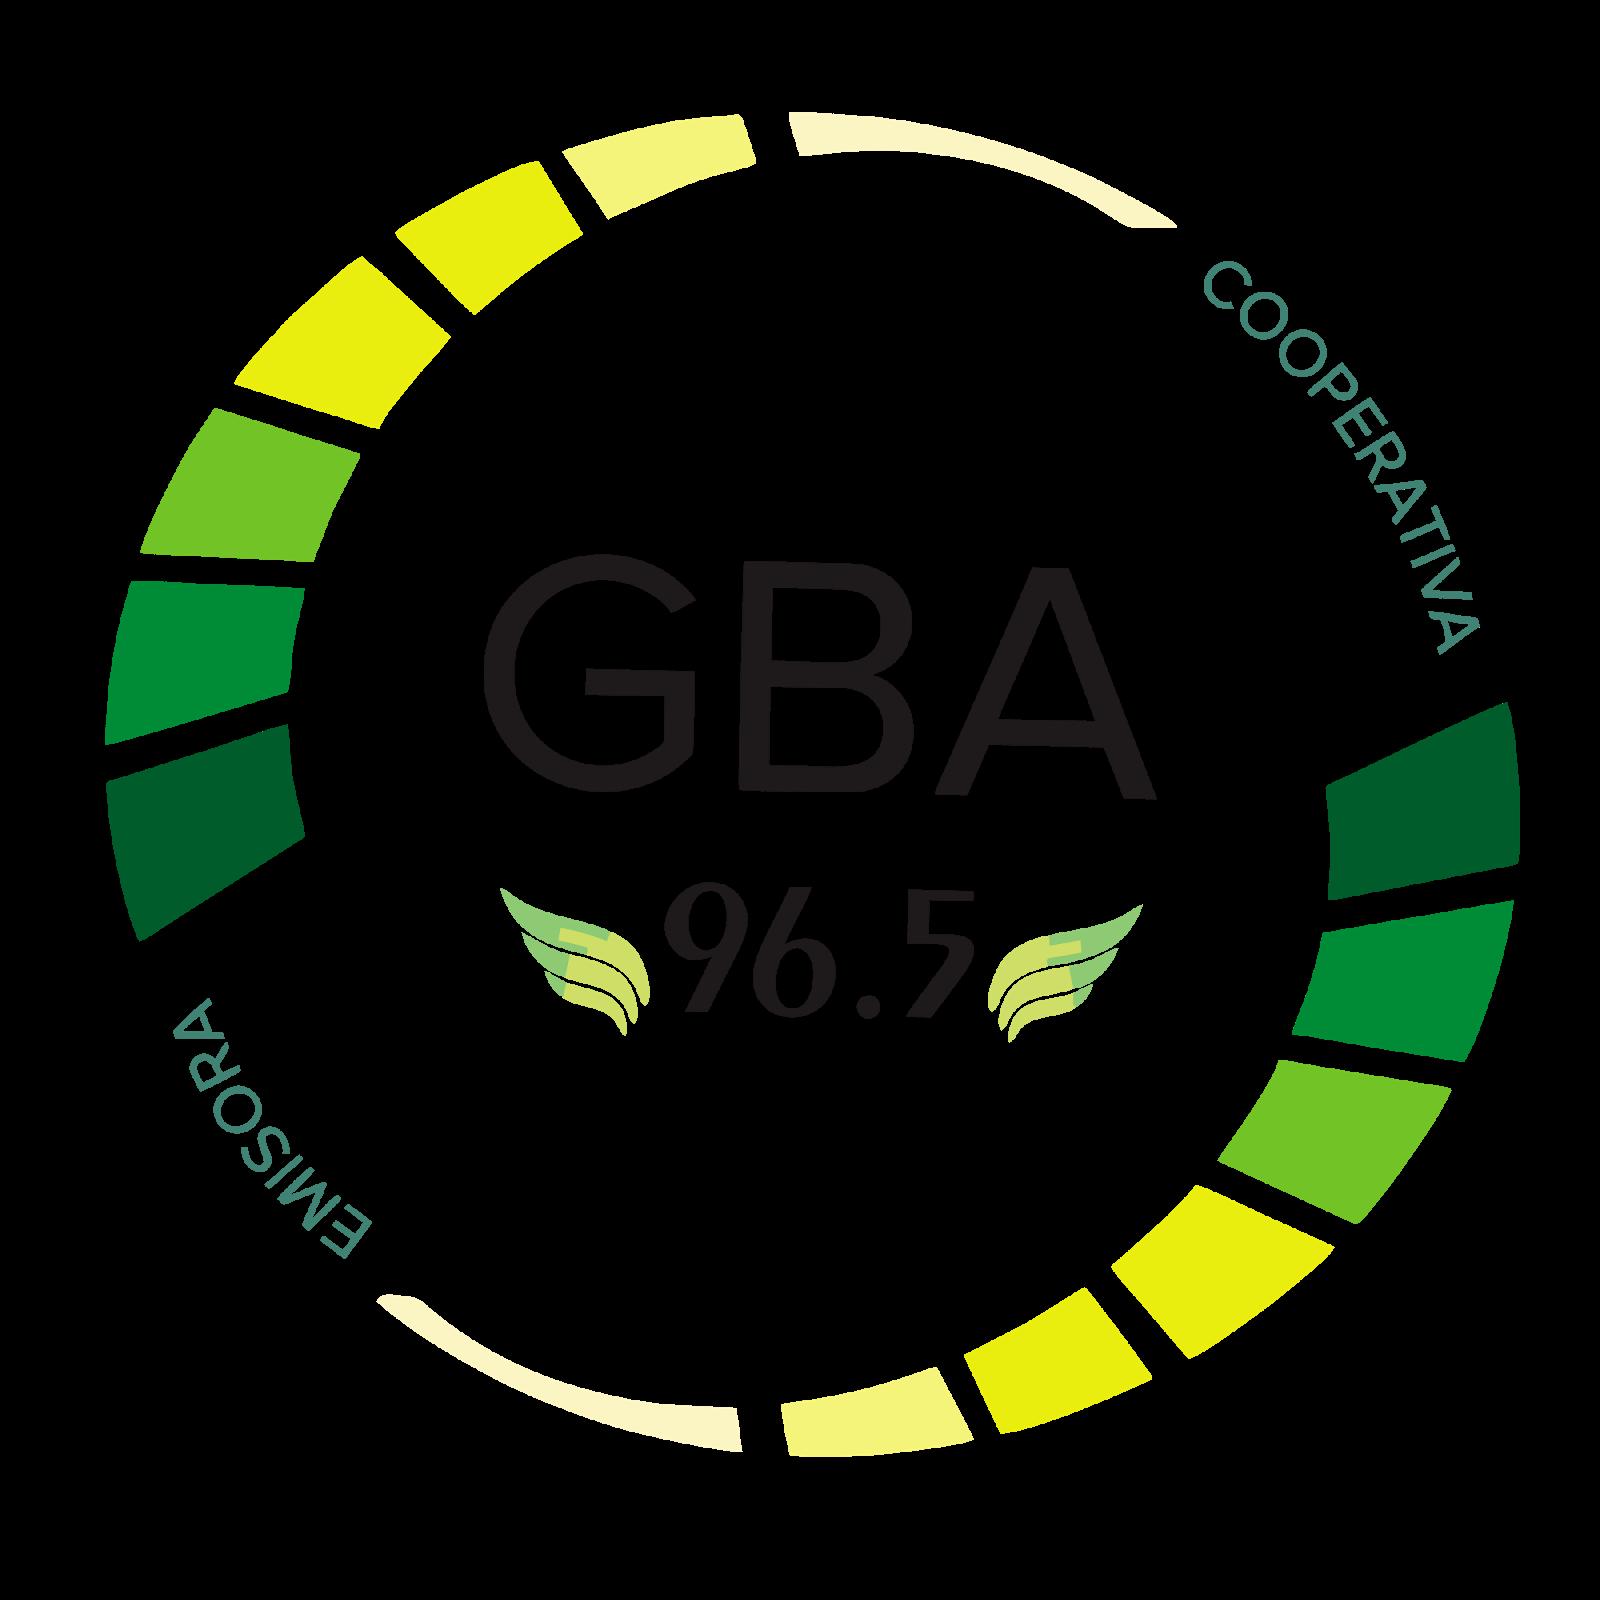 Radio GBA 96.5